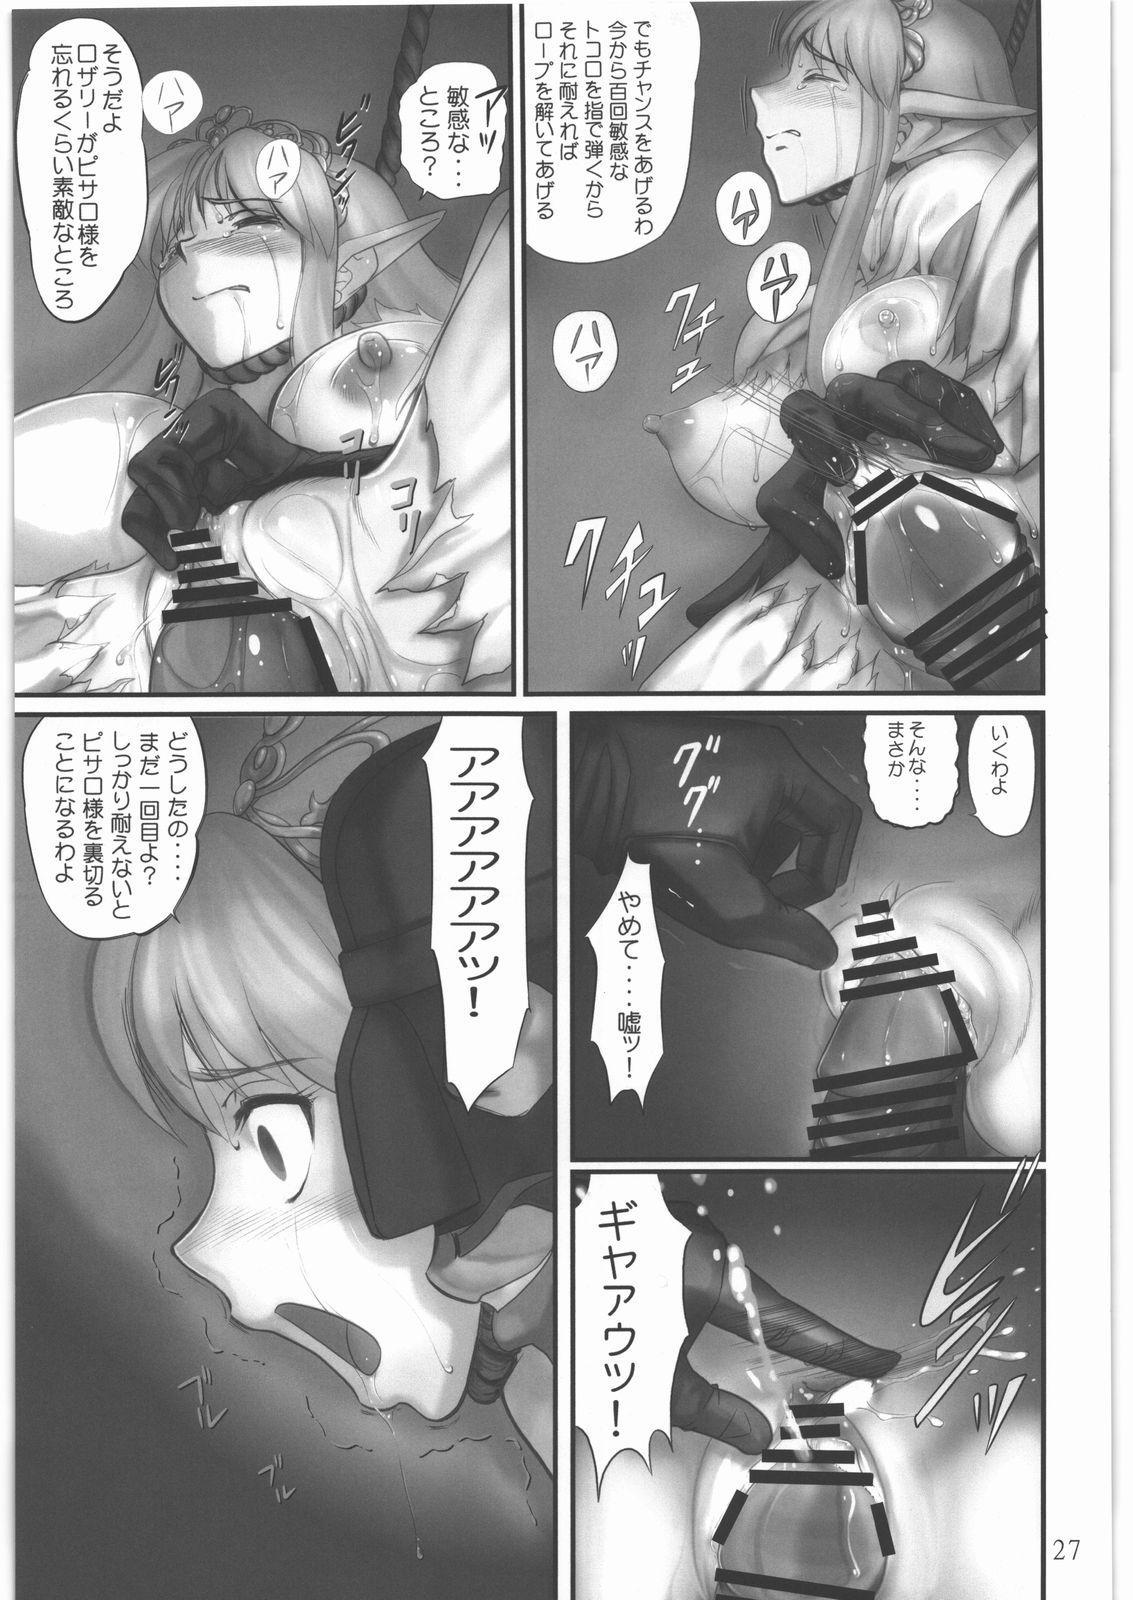 Elf Ryoujoku 25